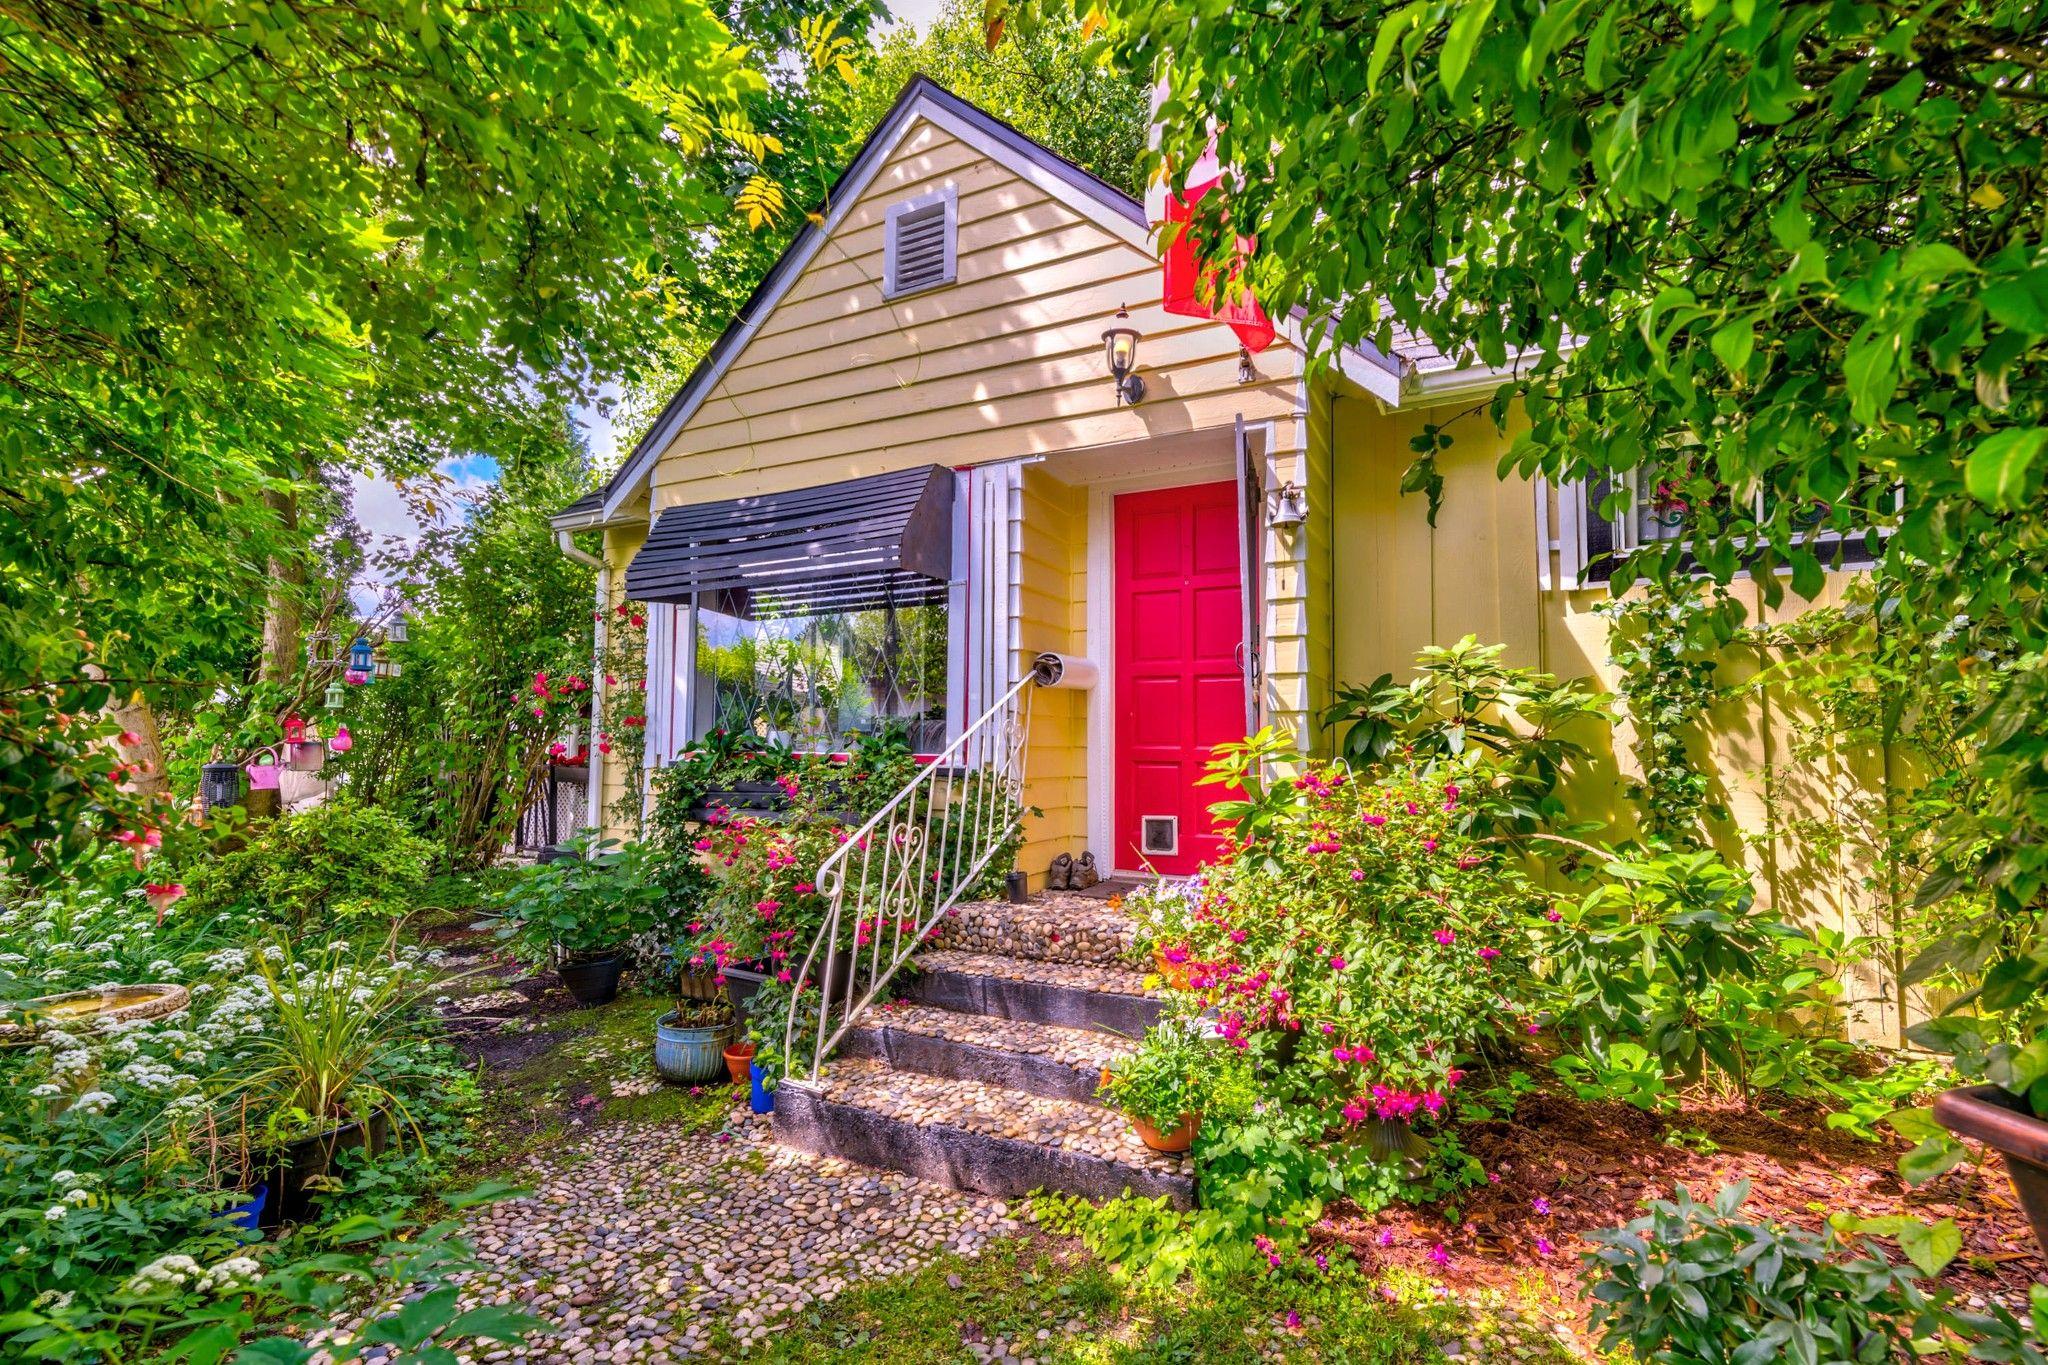 Photo 4: Photos: 20623 114 Avenue in Maple Ridge: Southwest Maple Ridge House for sale : MLS®# R2465656